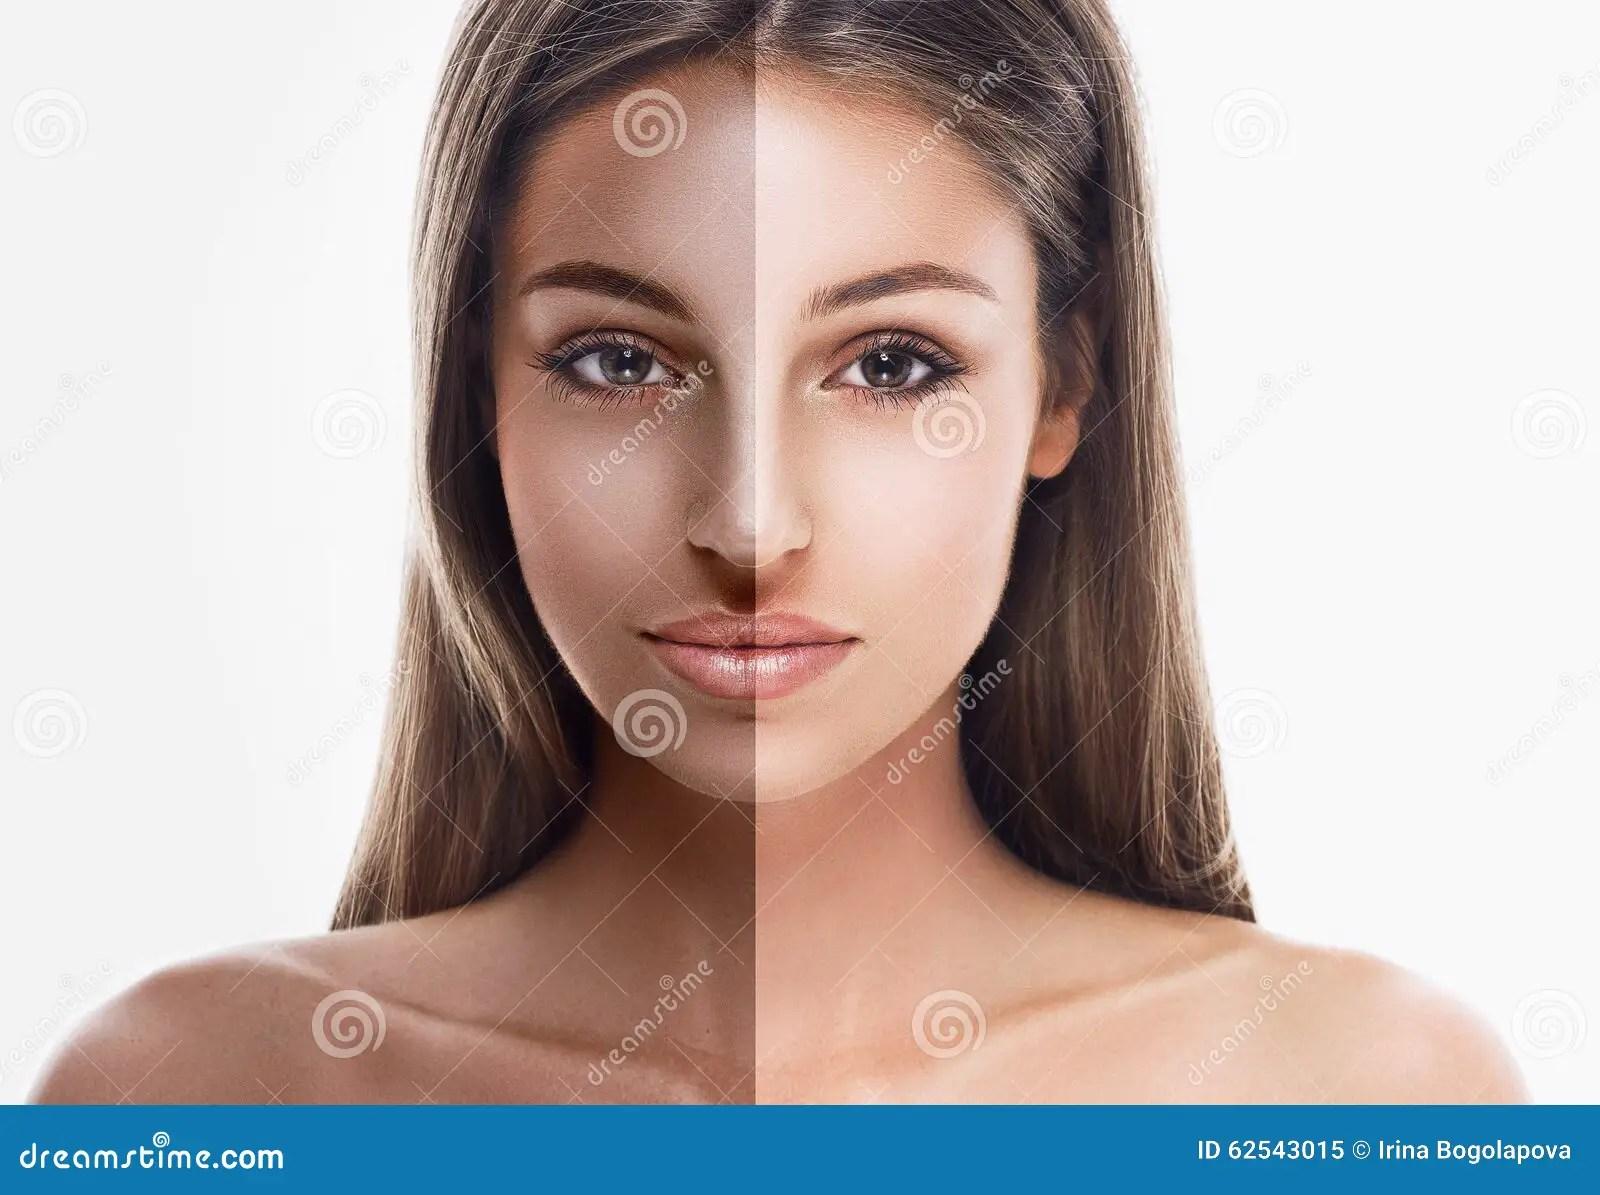 Woman Half Face Tan Beautiful Portrait Stock Photo